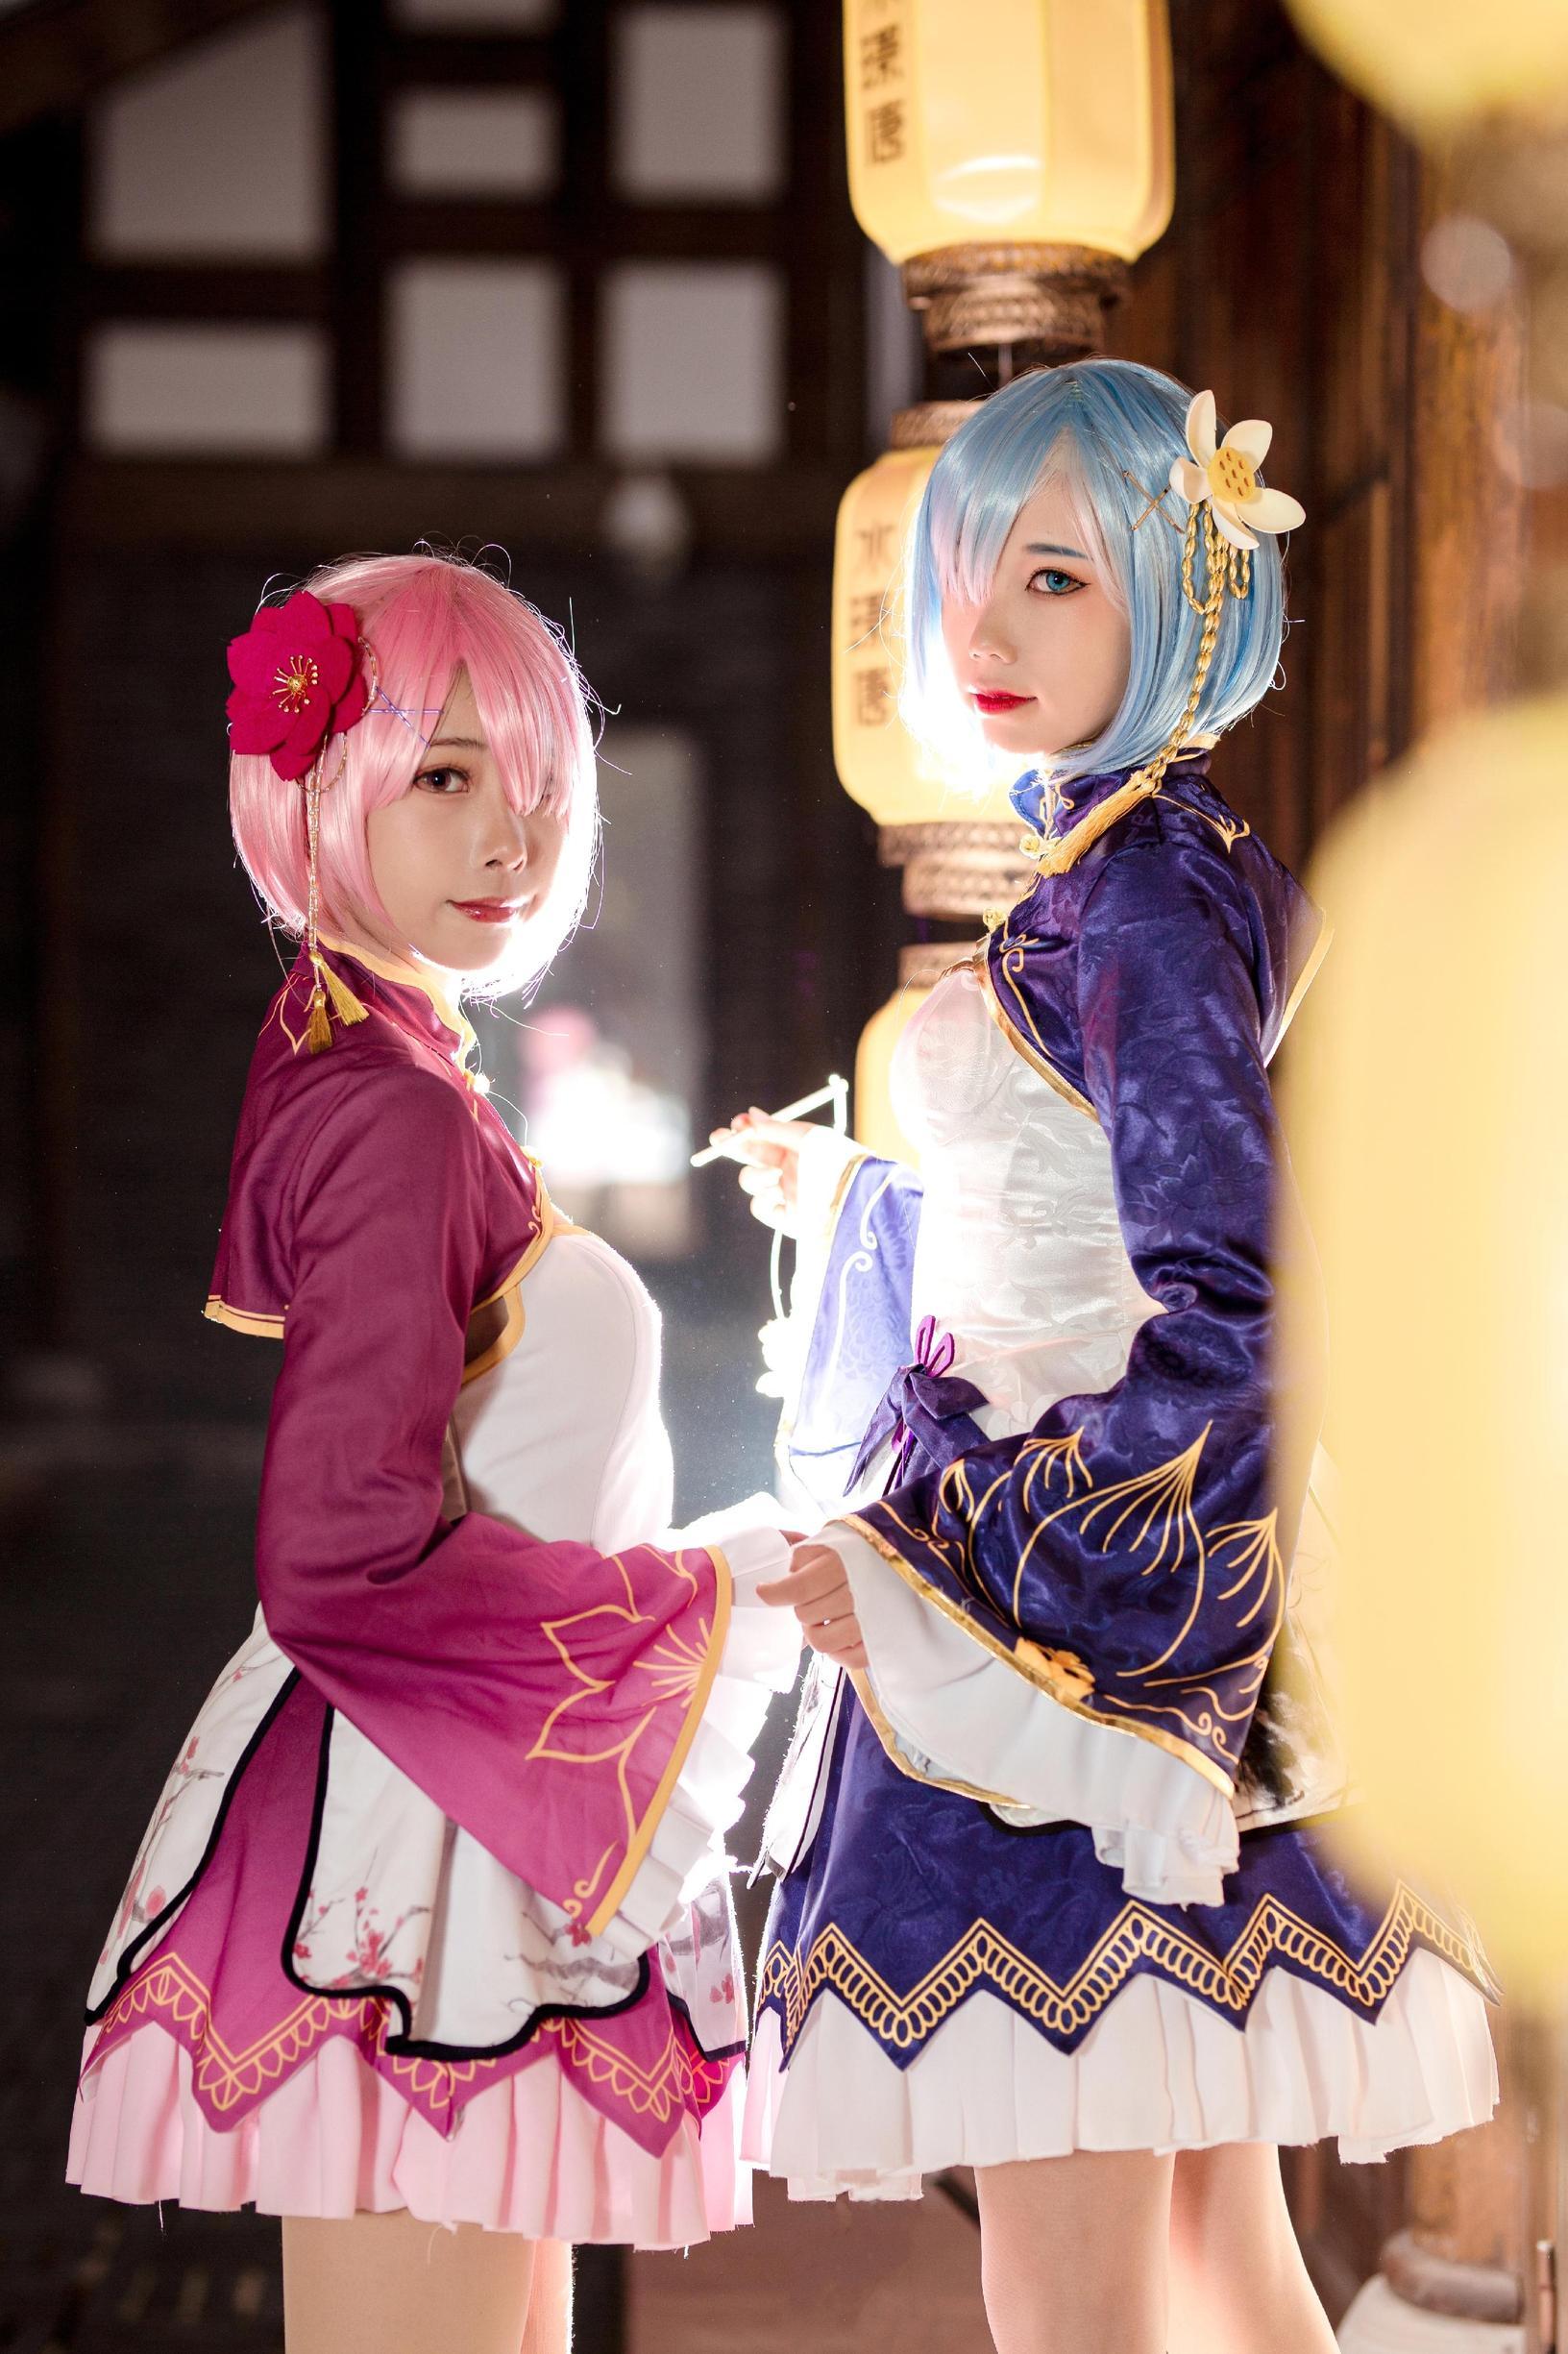 《RE:从零开始的异世界生活》正片cosplay【CN:柒八氿】-第3张